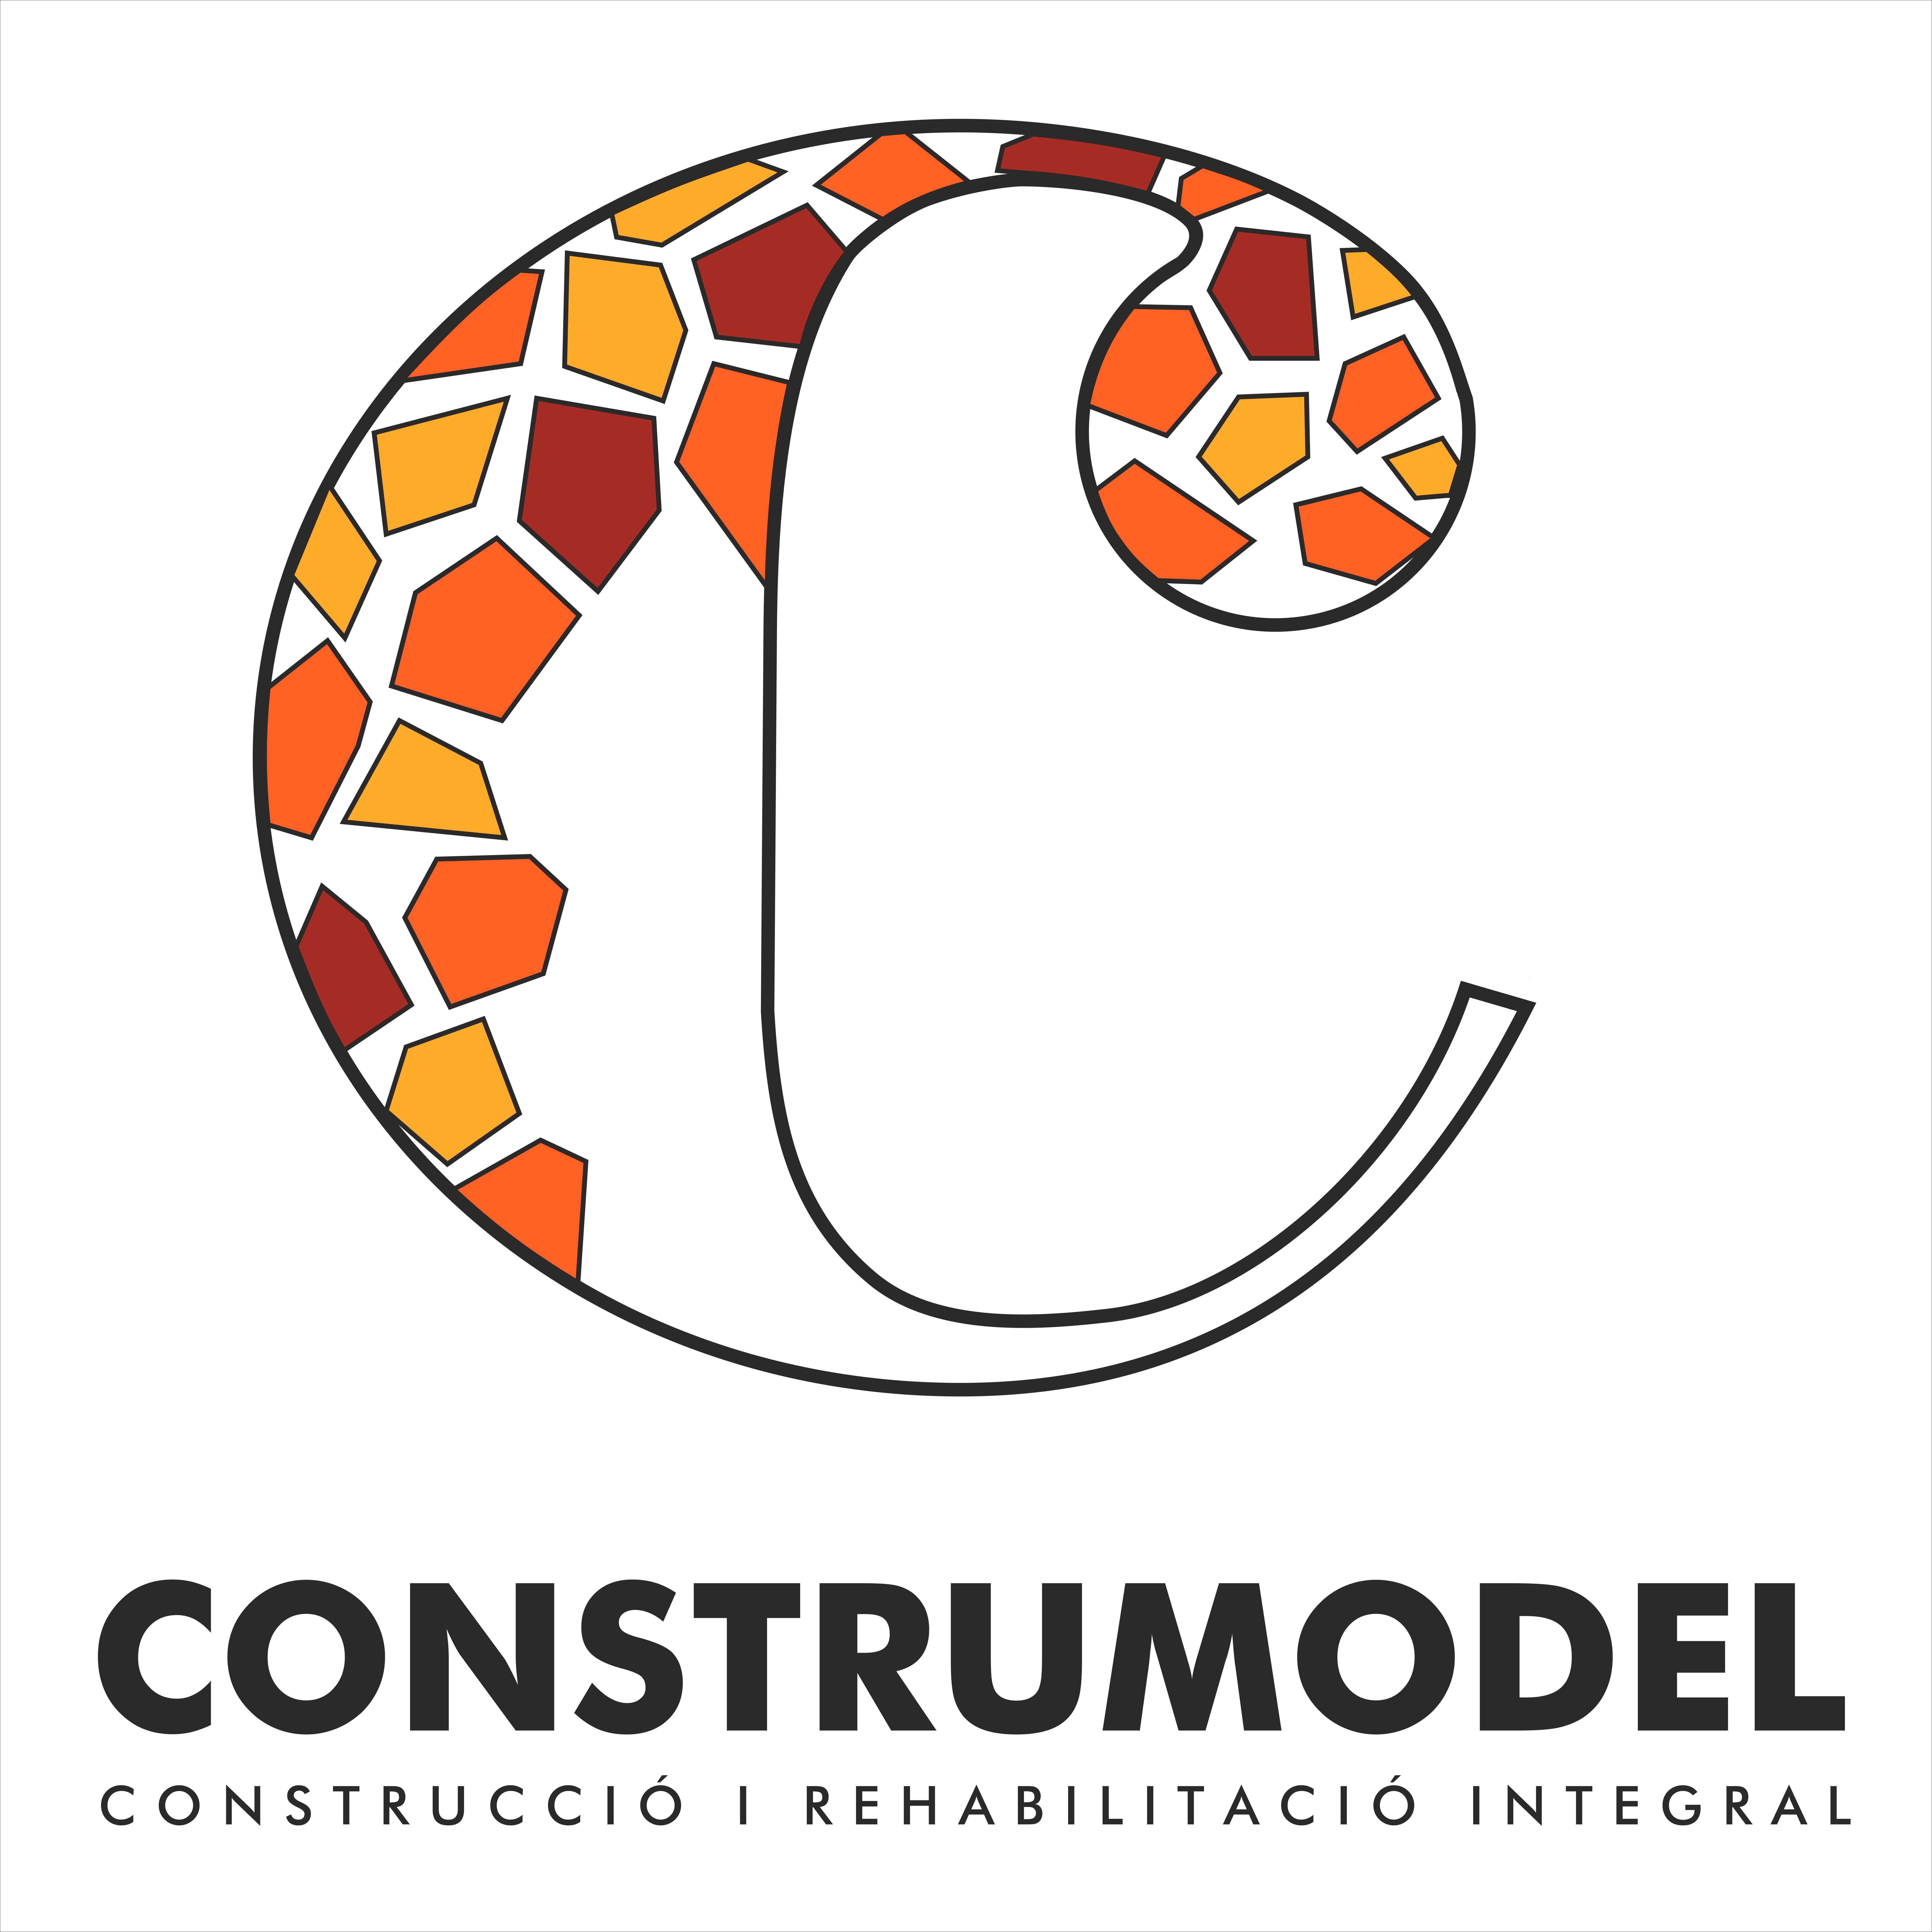 Construmodel